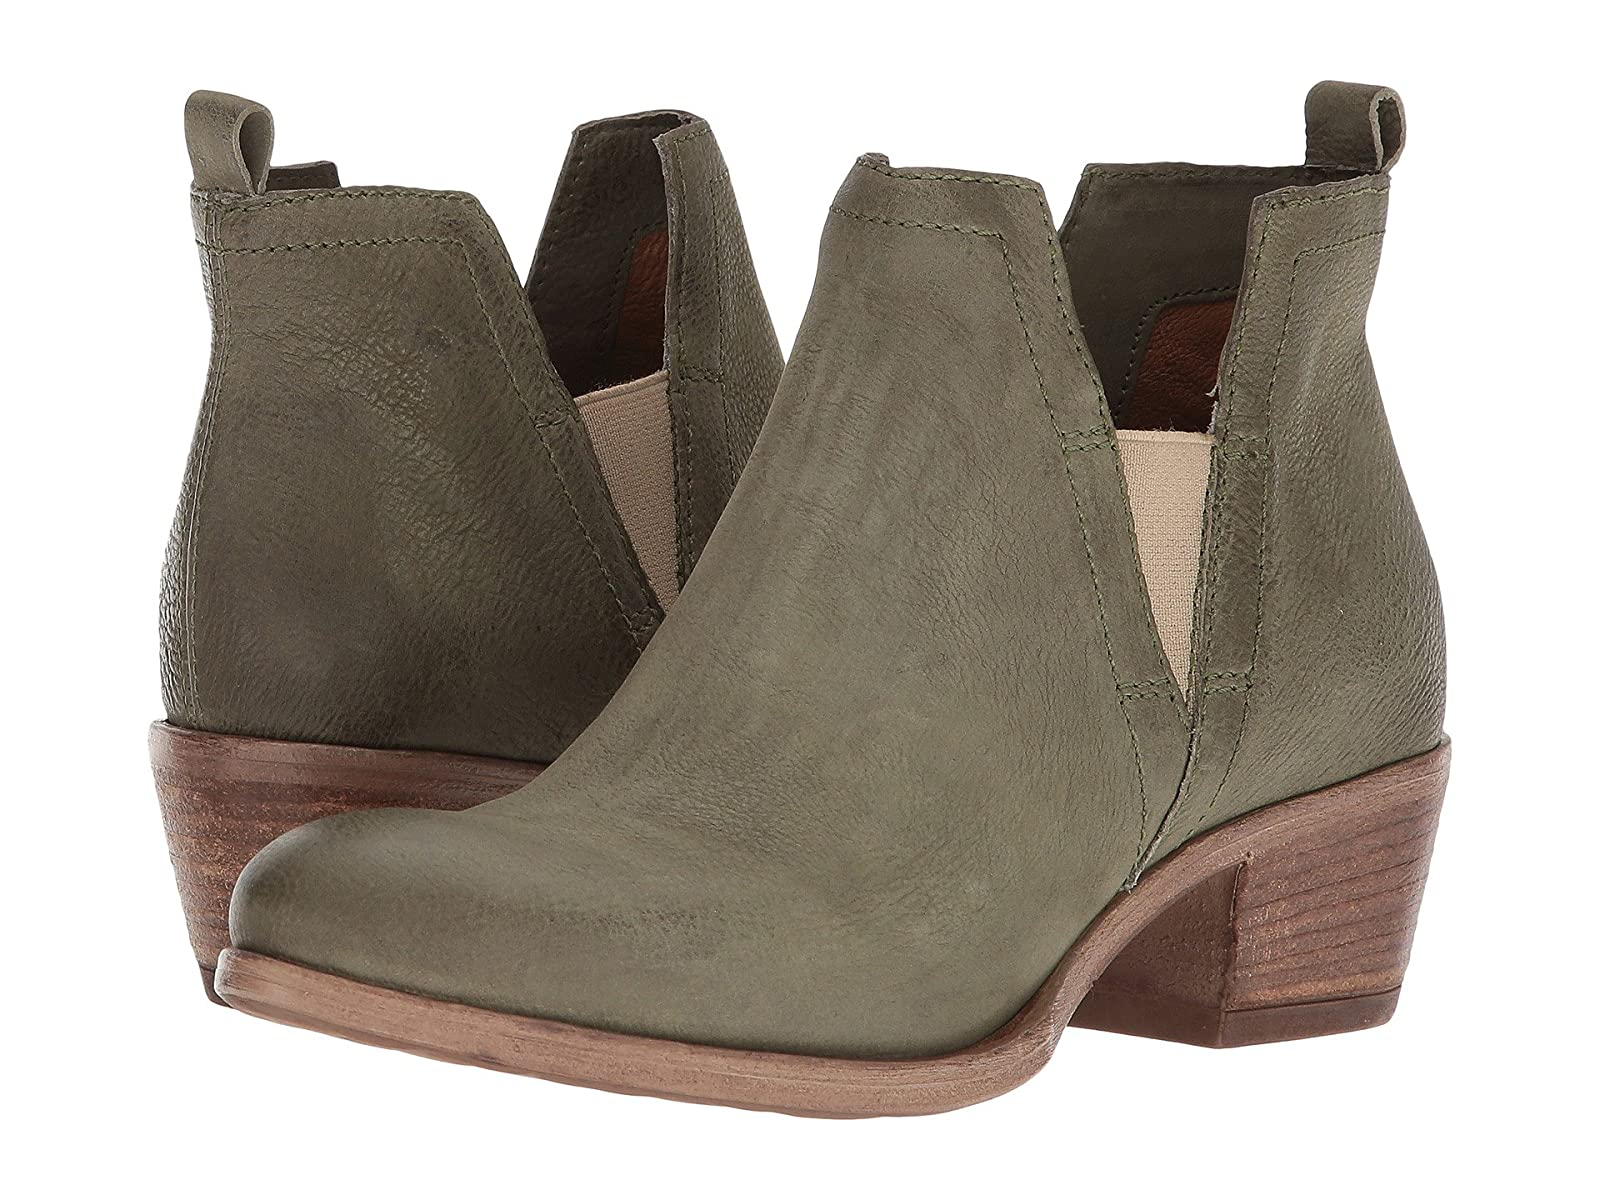 Miz Mooz DaliaCheap and distinctive eye-catching shoes